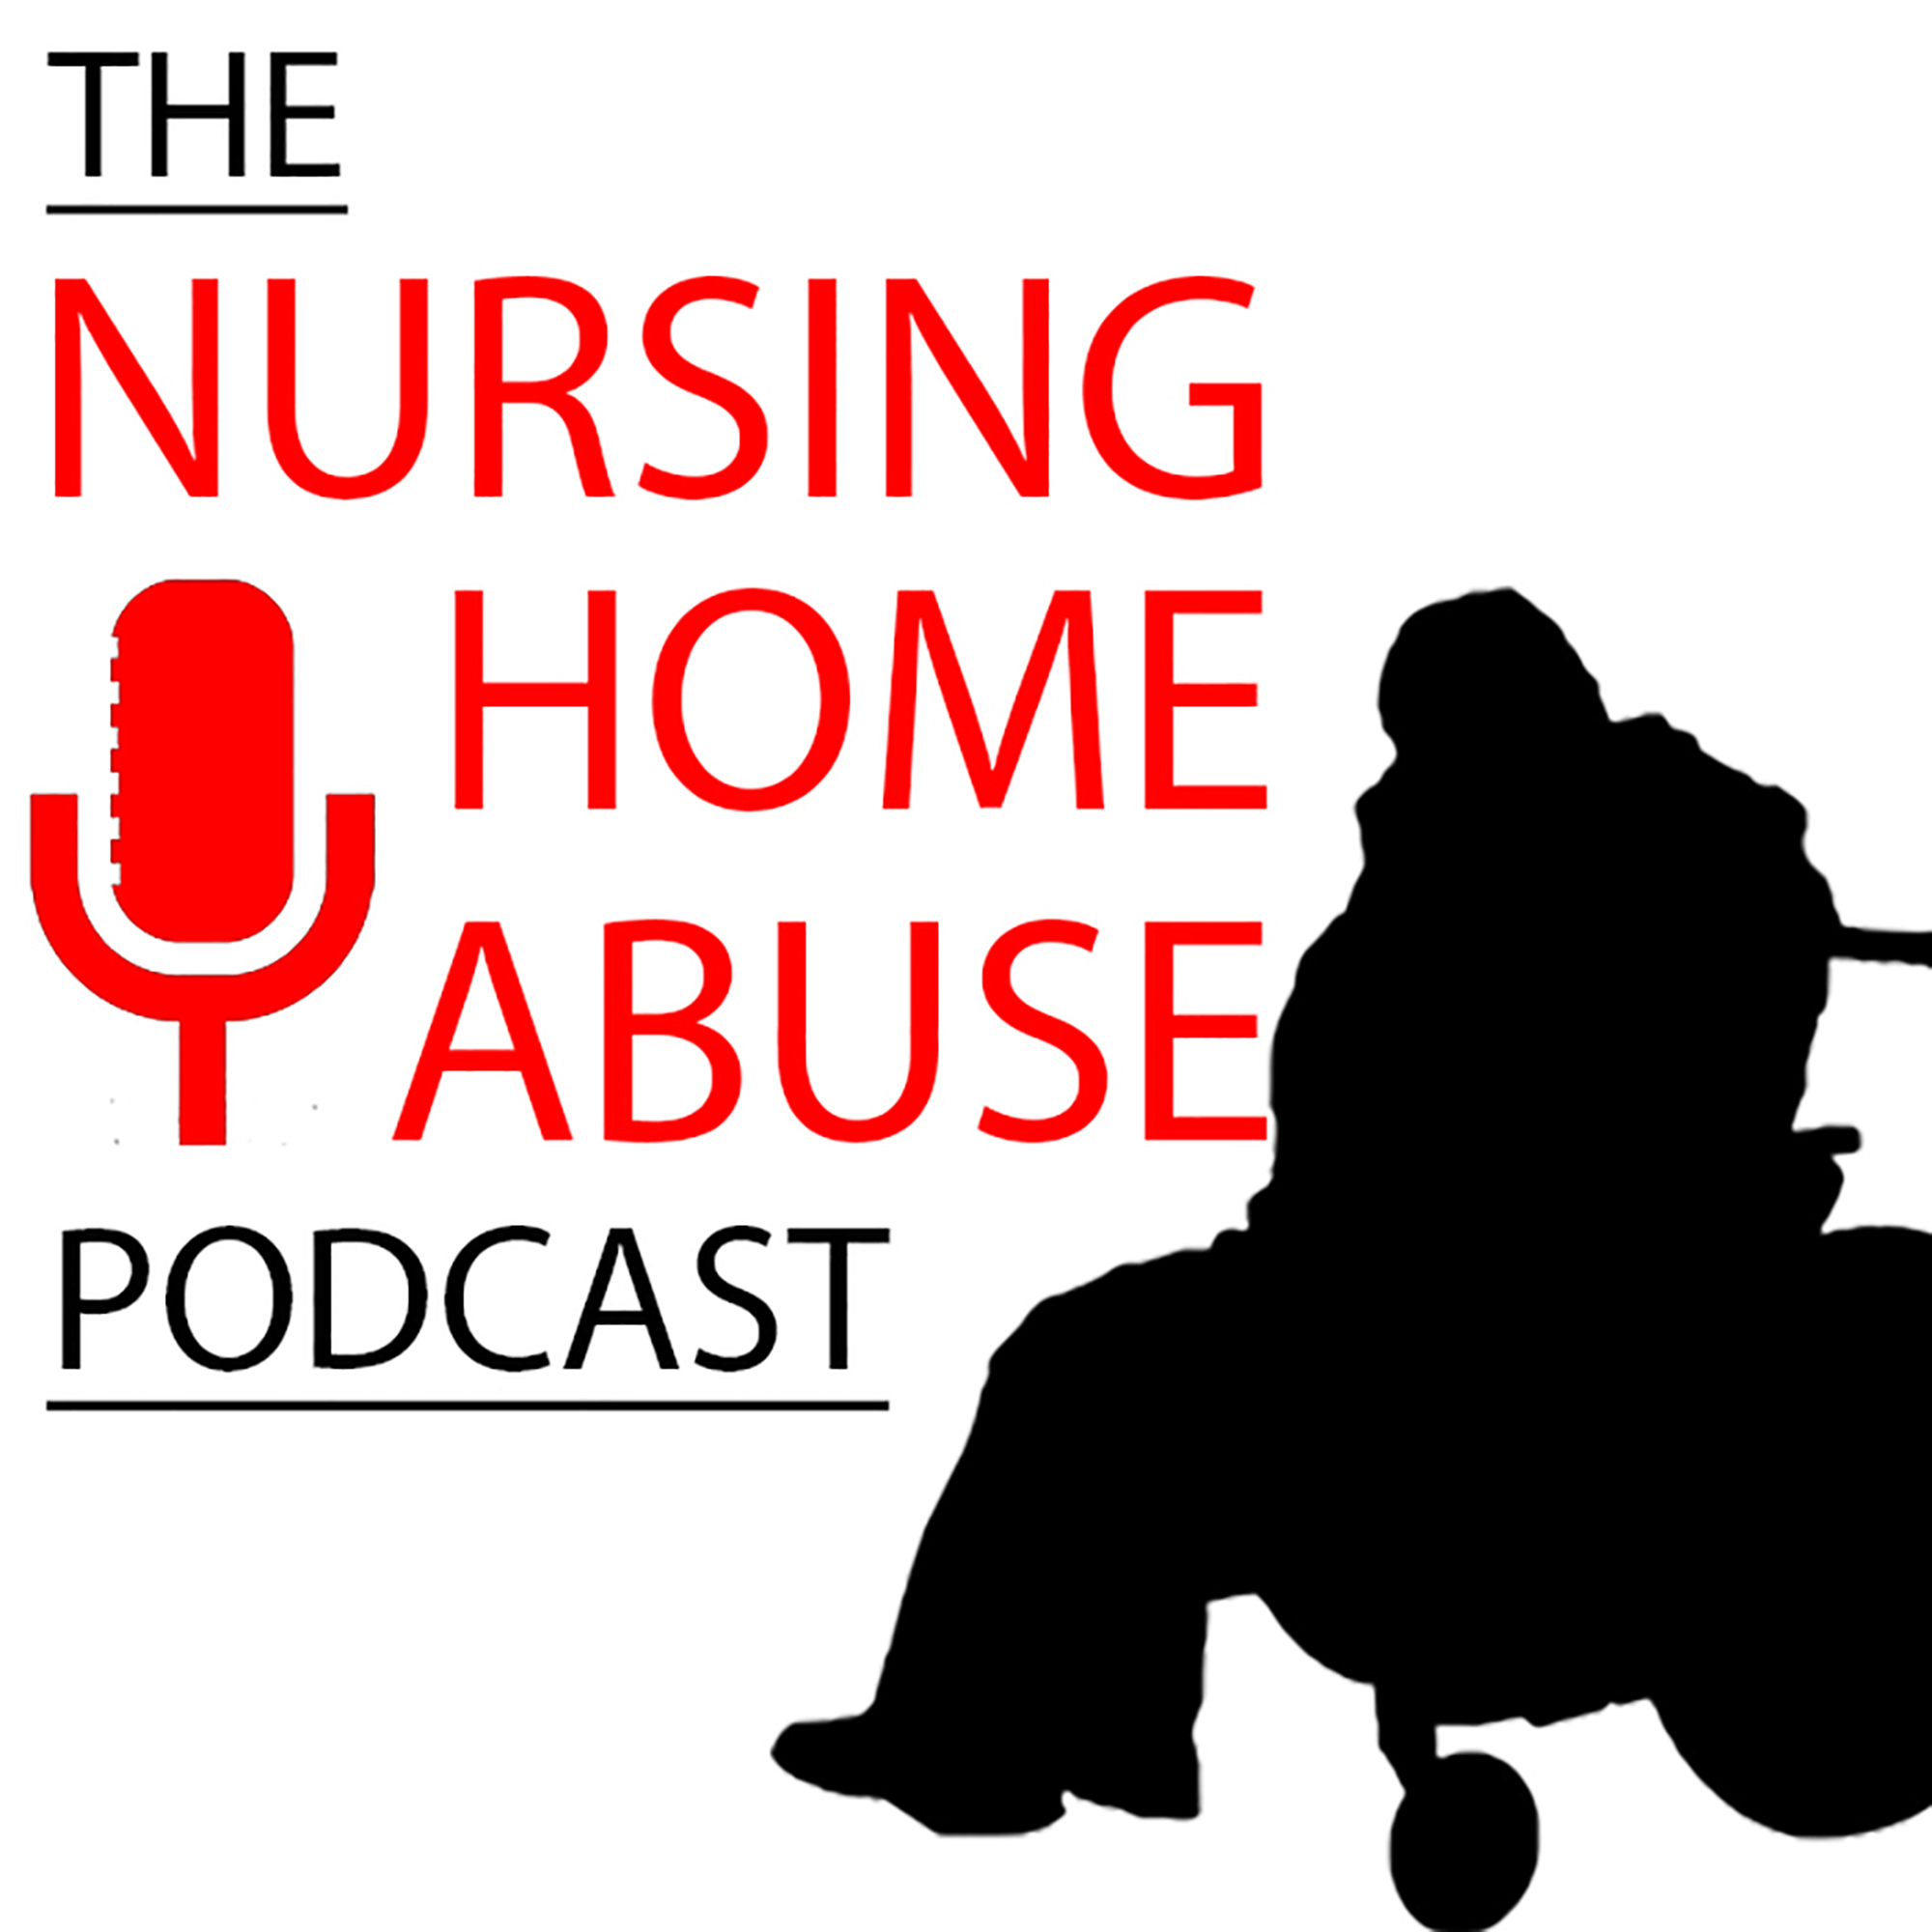 167 - Culture change in nursing homes